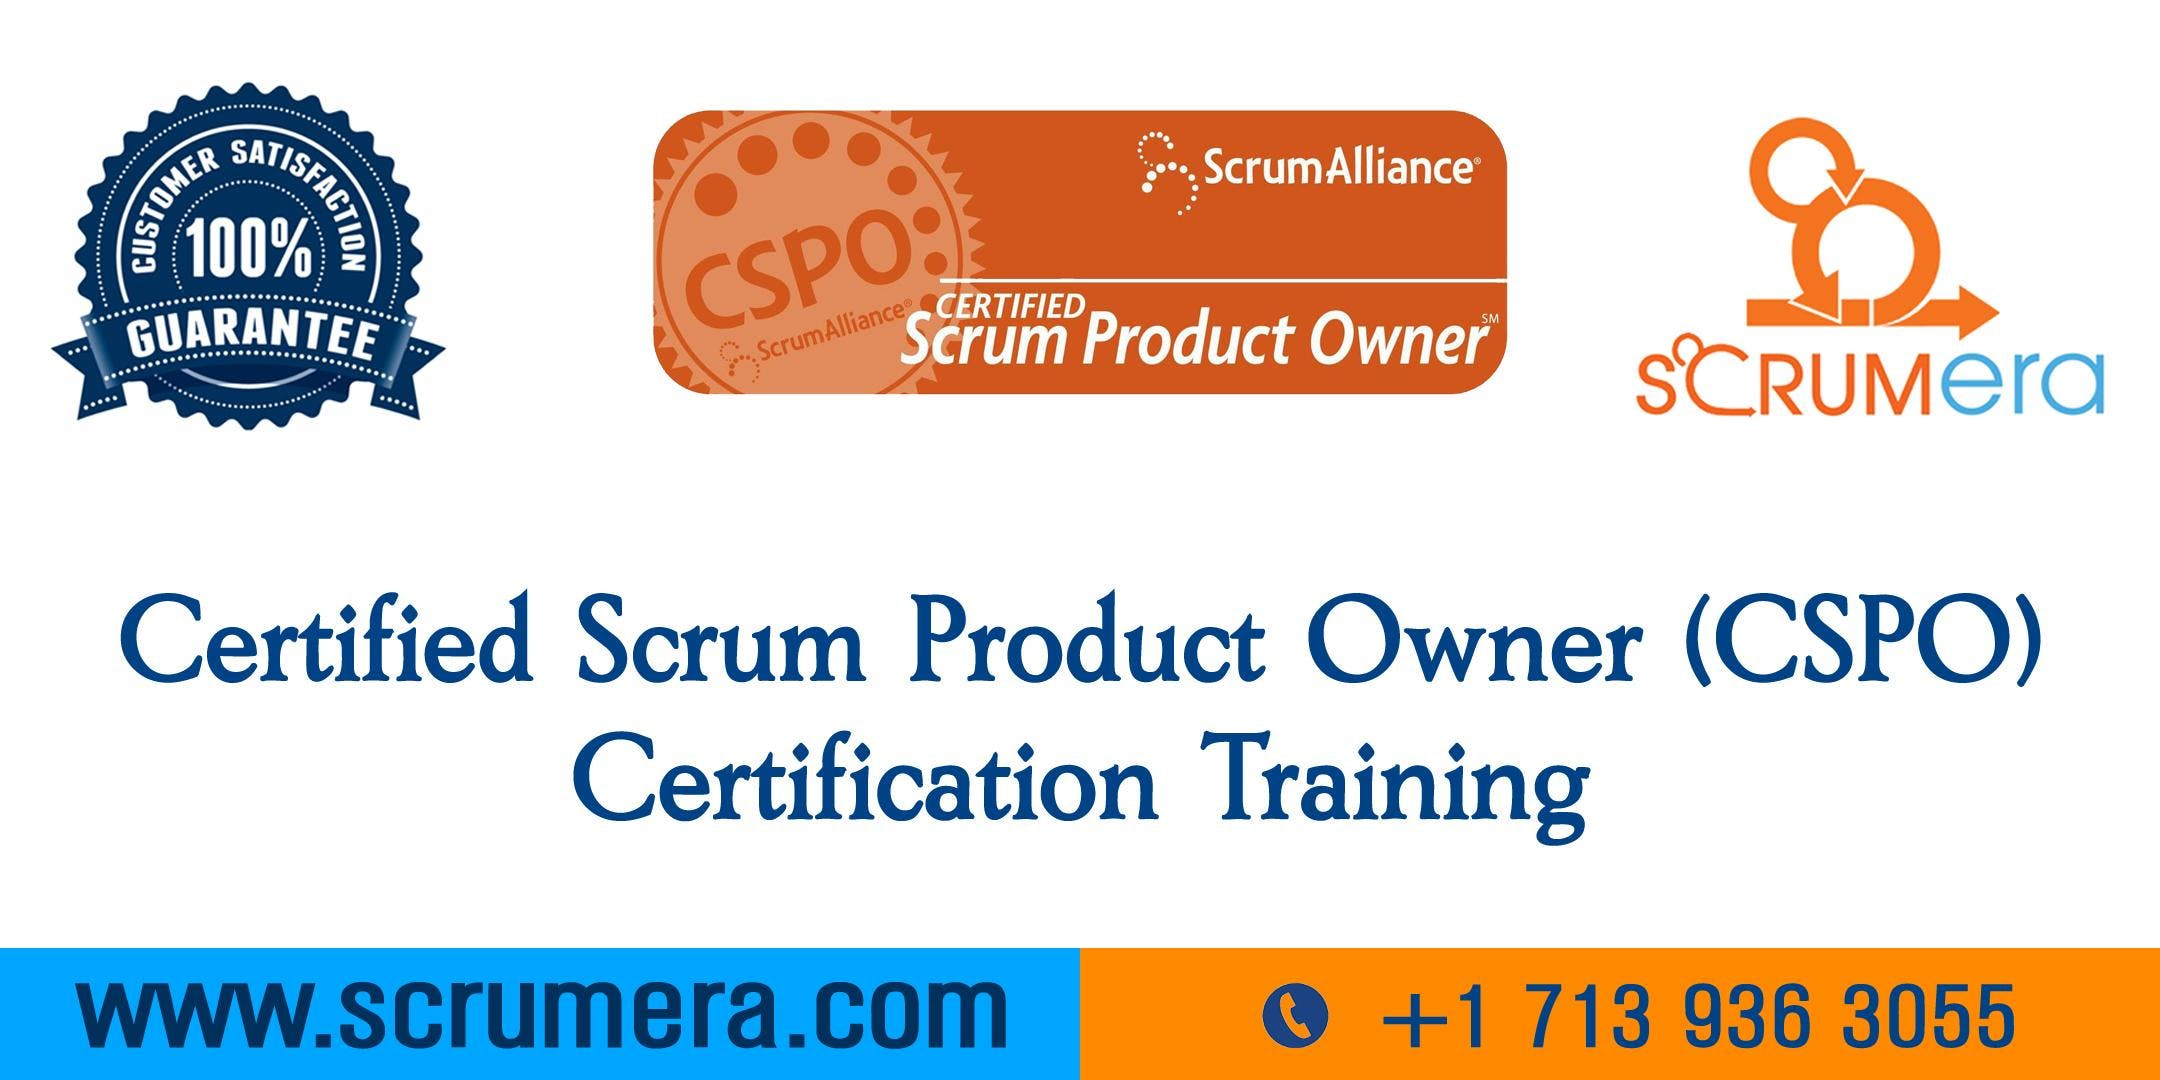 Certified Scrum Product Owner (CSPO) Certification   CSPO Training   CSPO Certification Workshop   Certified Scrum Product Owner (CSPO) Training in Phoenix, AZ   ScrumERA